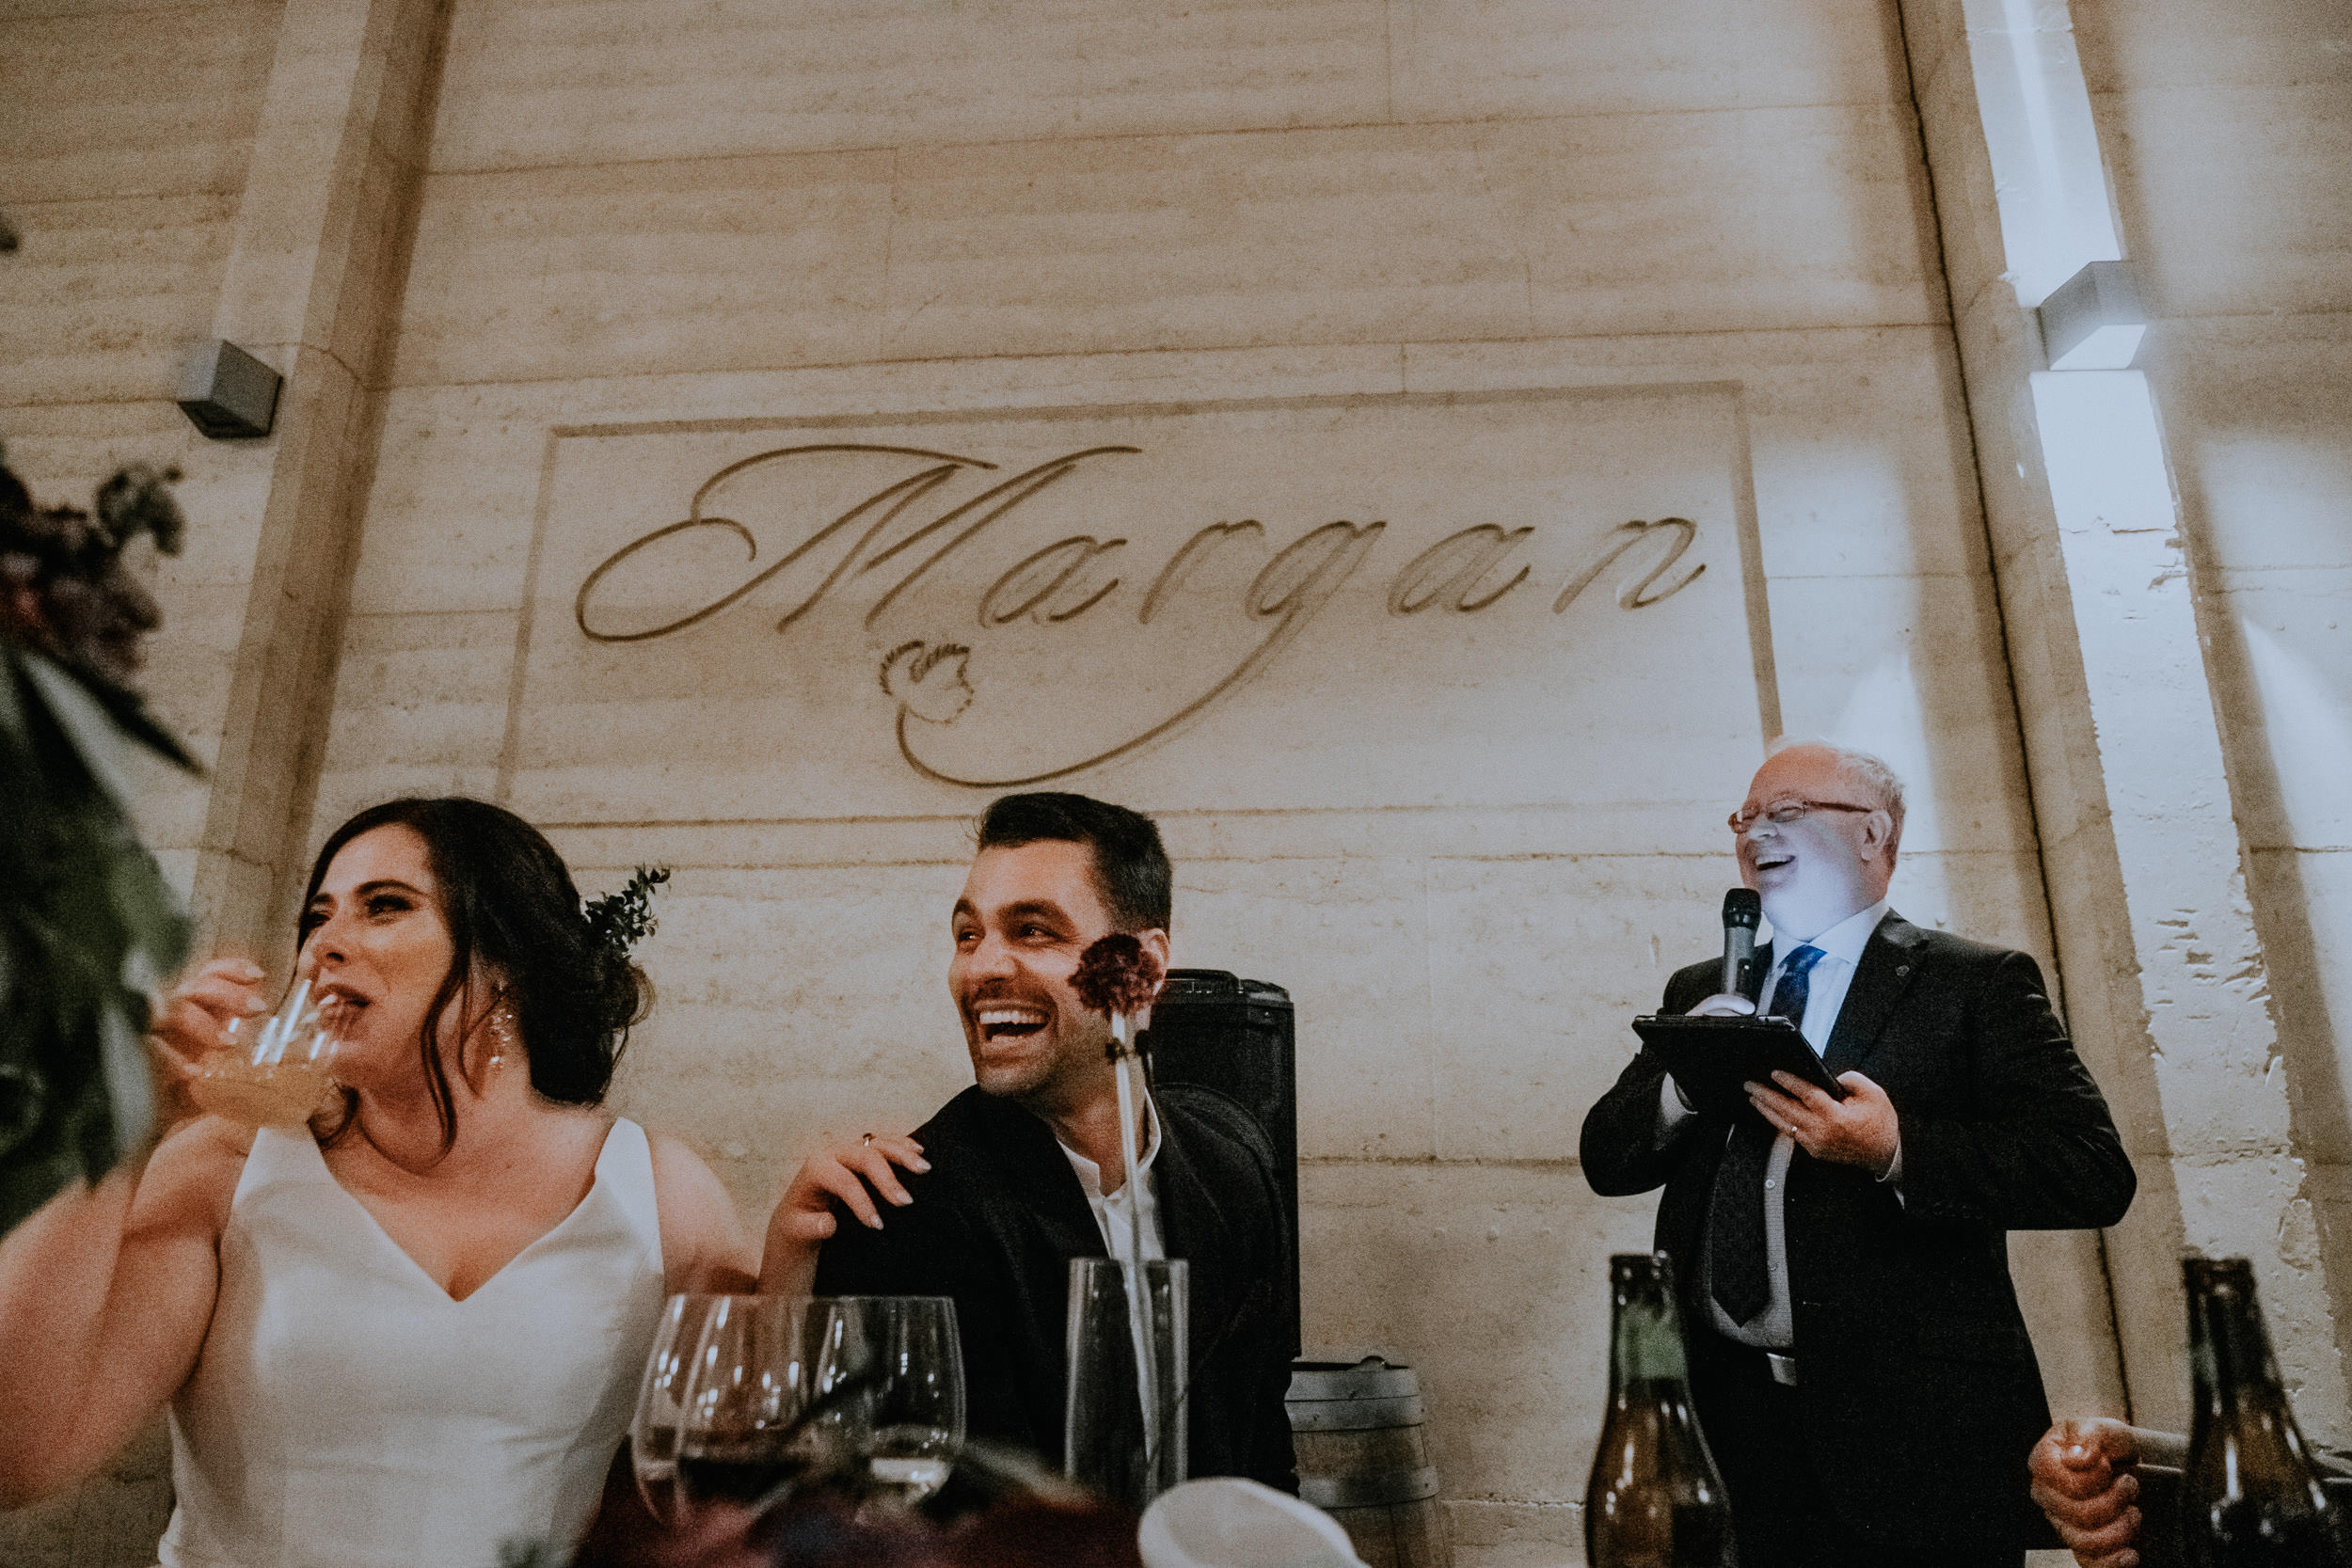 s+j_top_elopement wedding photography_kings & thieves_blog - 506.jpg